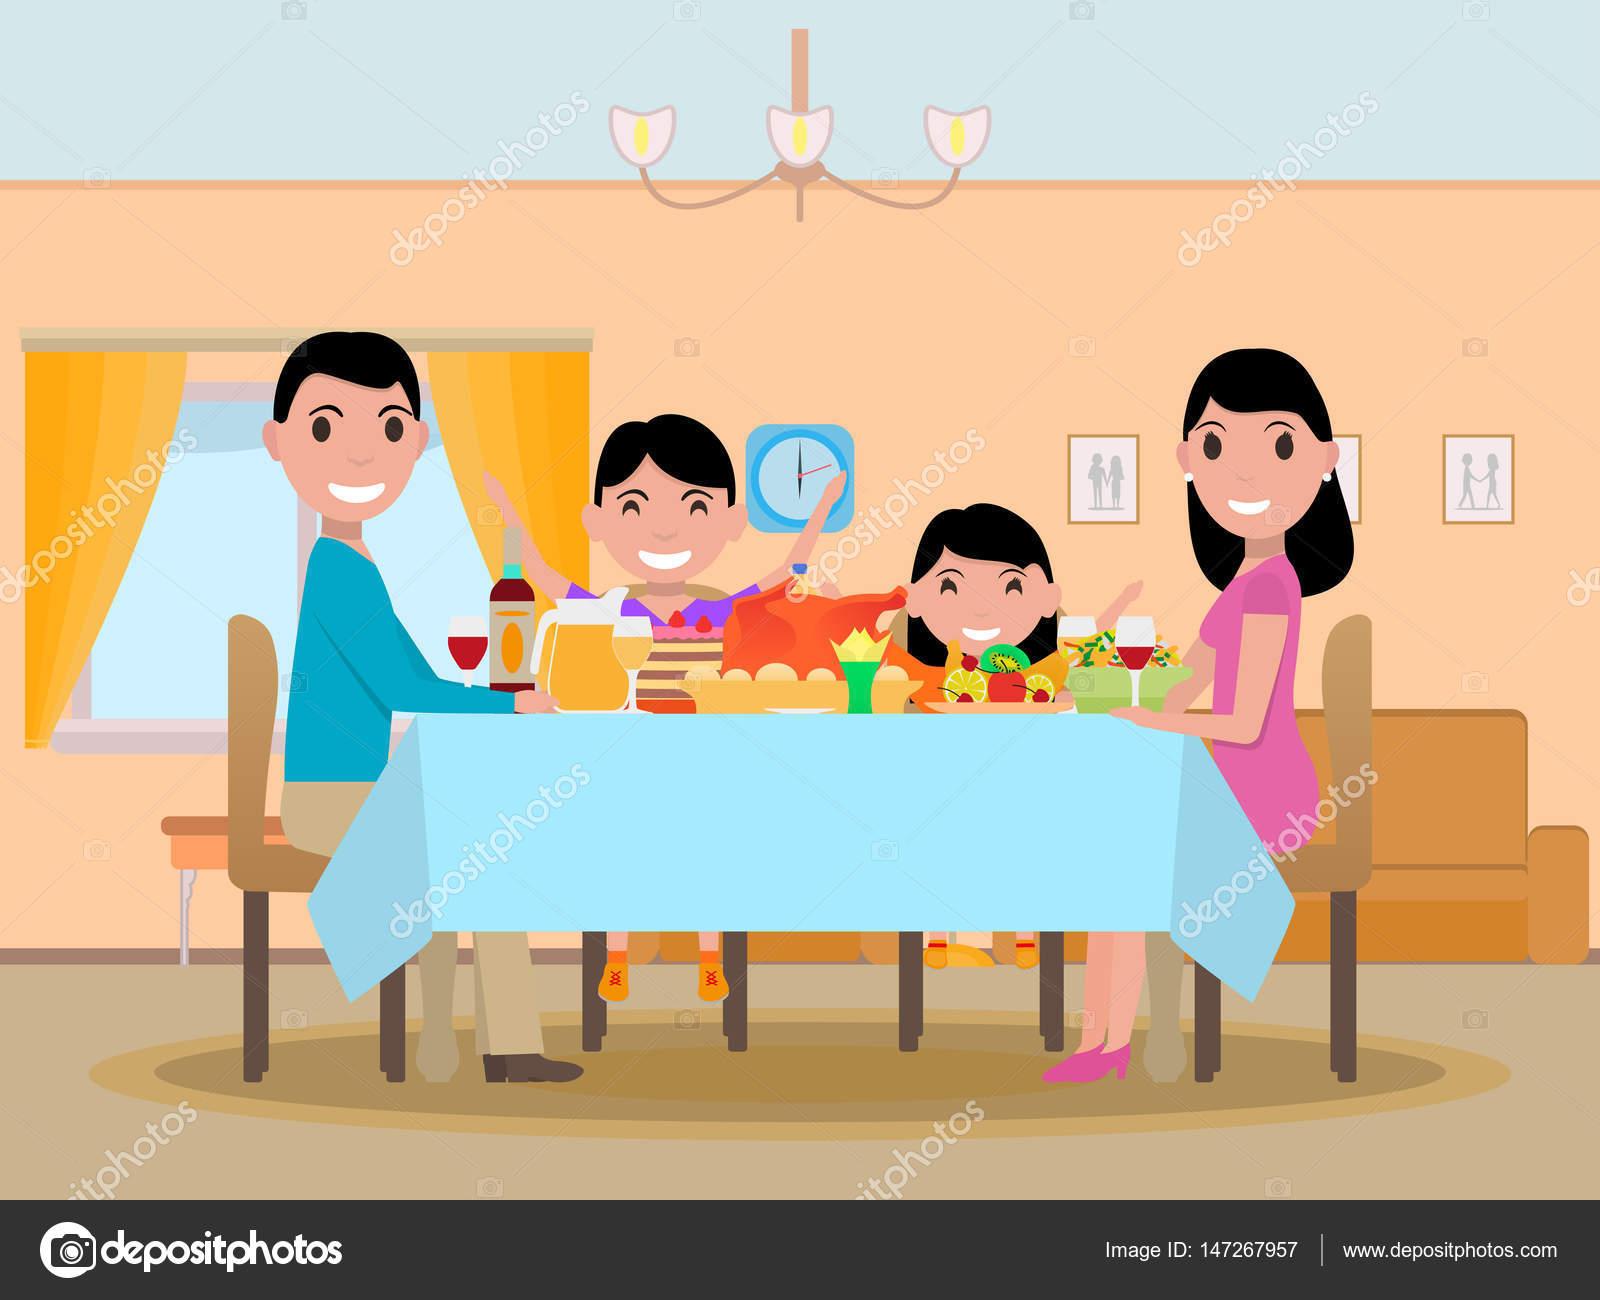 Vetor Desenho Animado Feliz Festivo Jantar Mesa Família